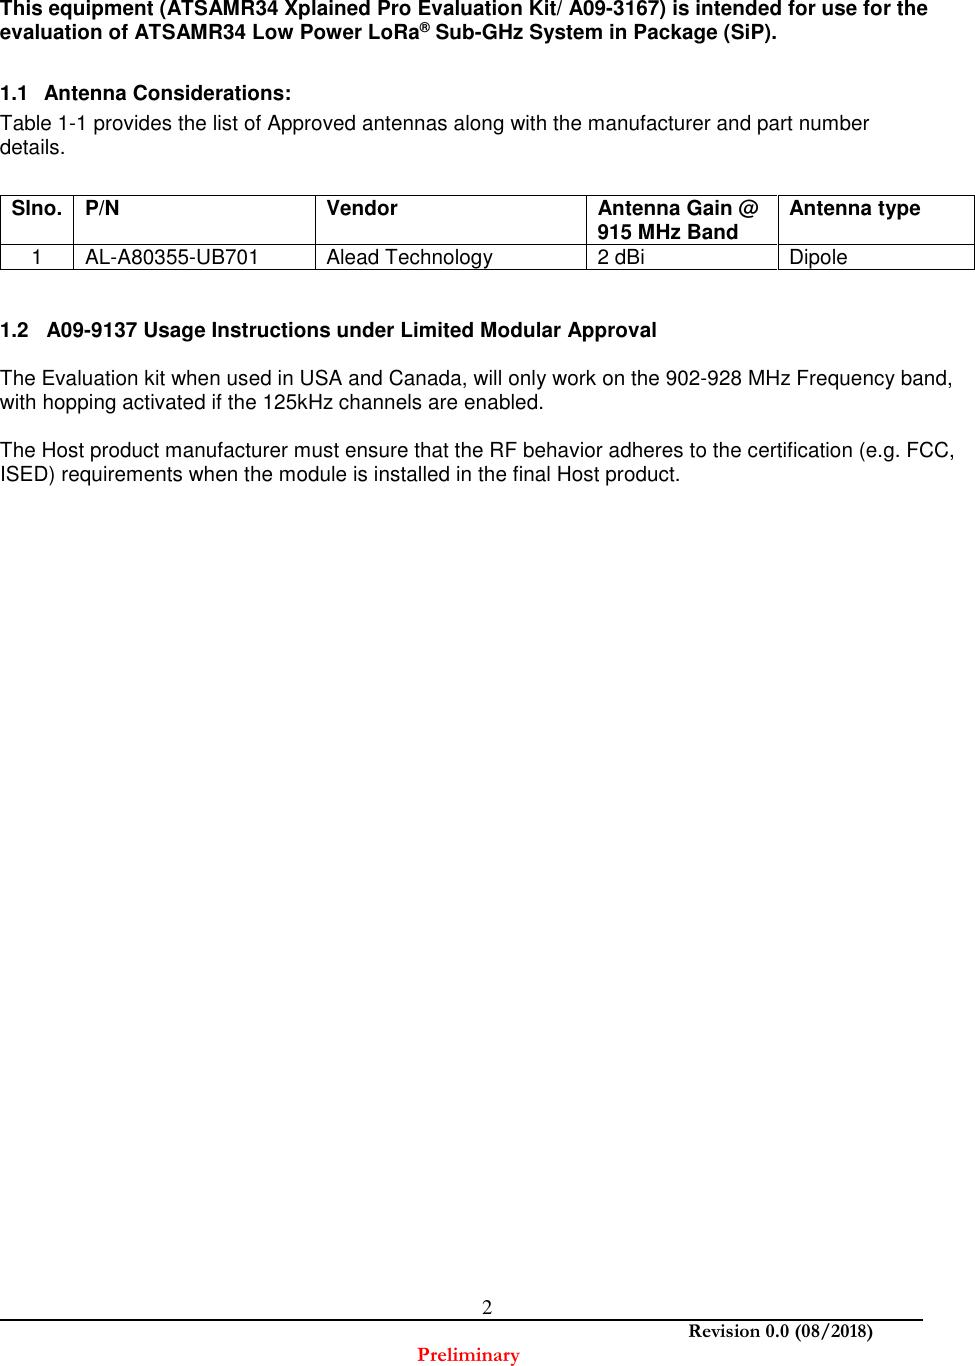 MICROCHIP TECHNOLOGY A093167 SAM R34 Xplained Pro Evaluation